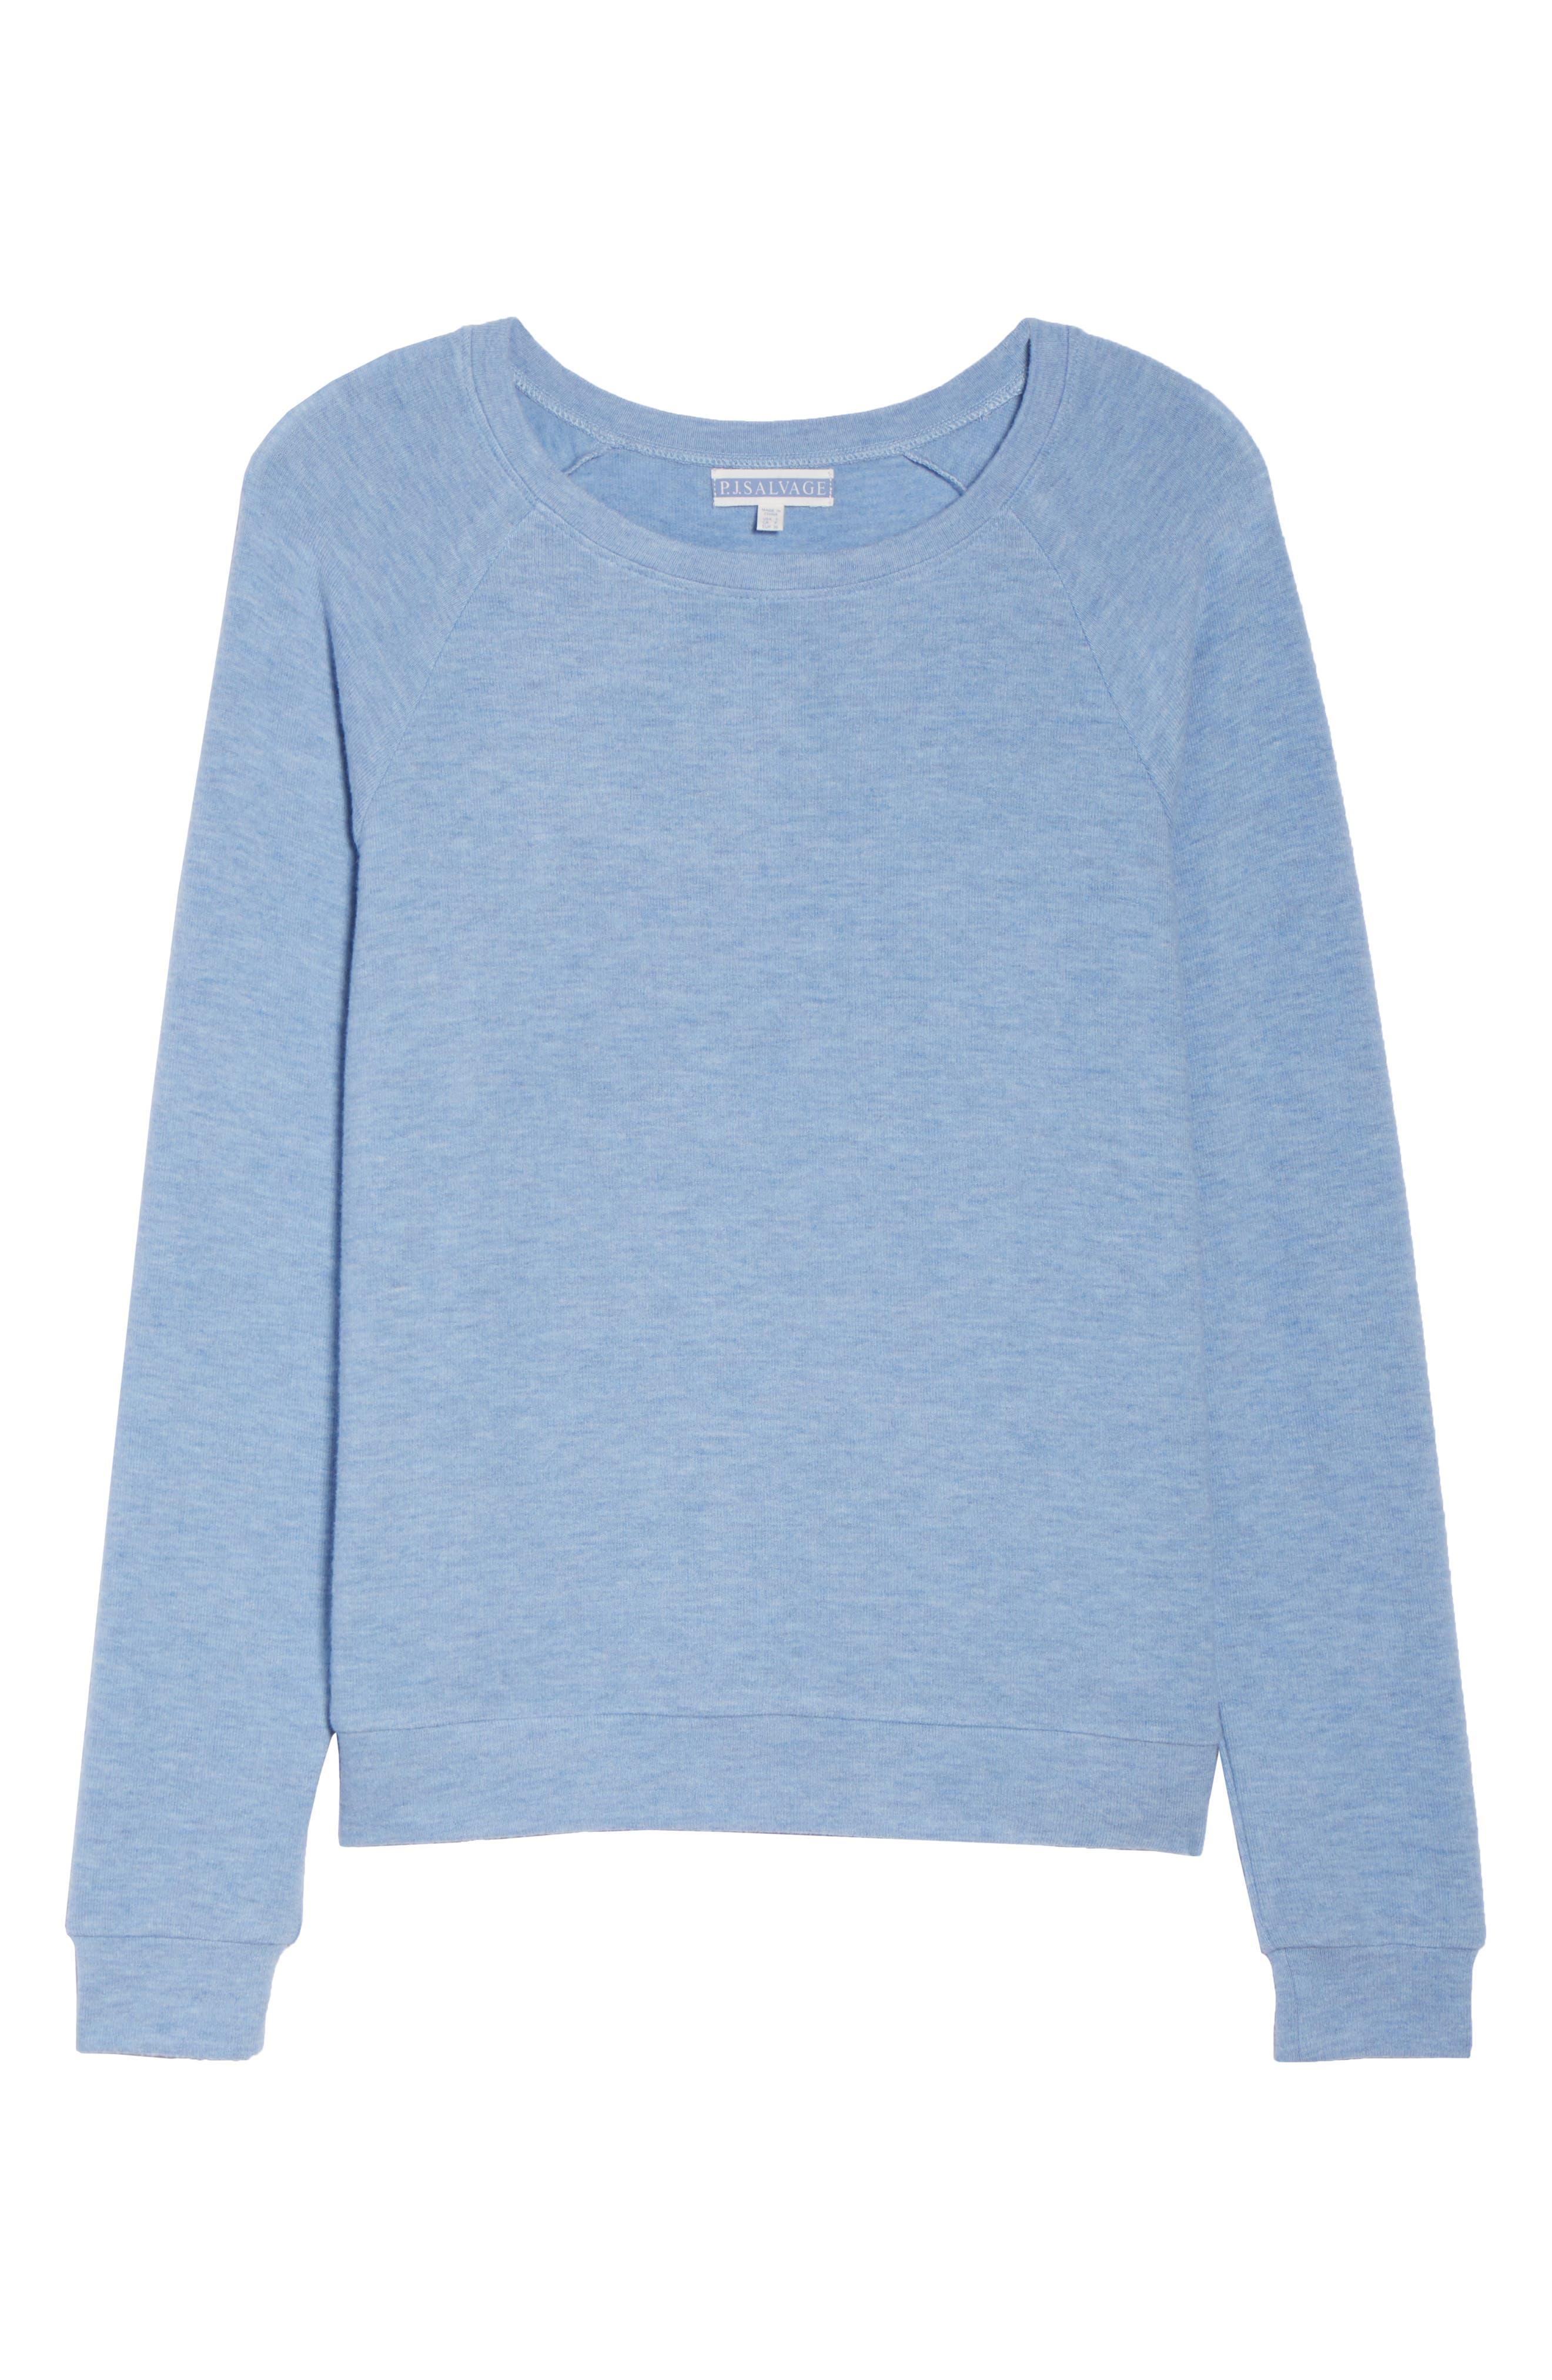 Peachy Pajama Shirt,                             Alternate thumbnail 4, color,                             Blue